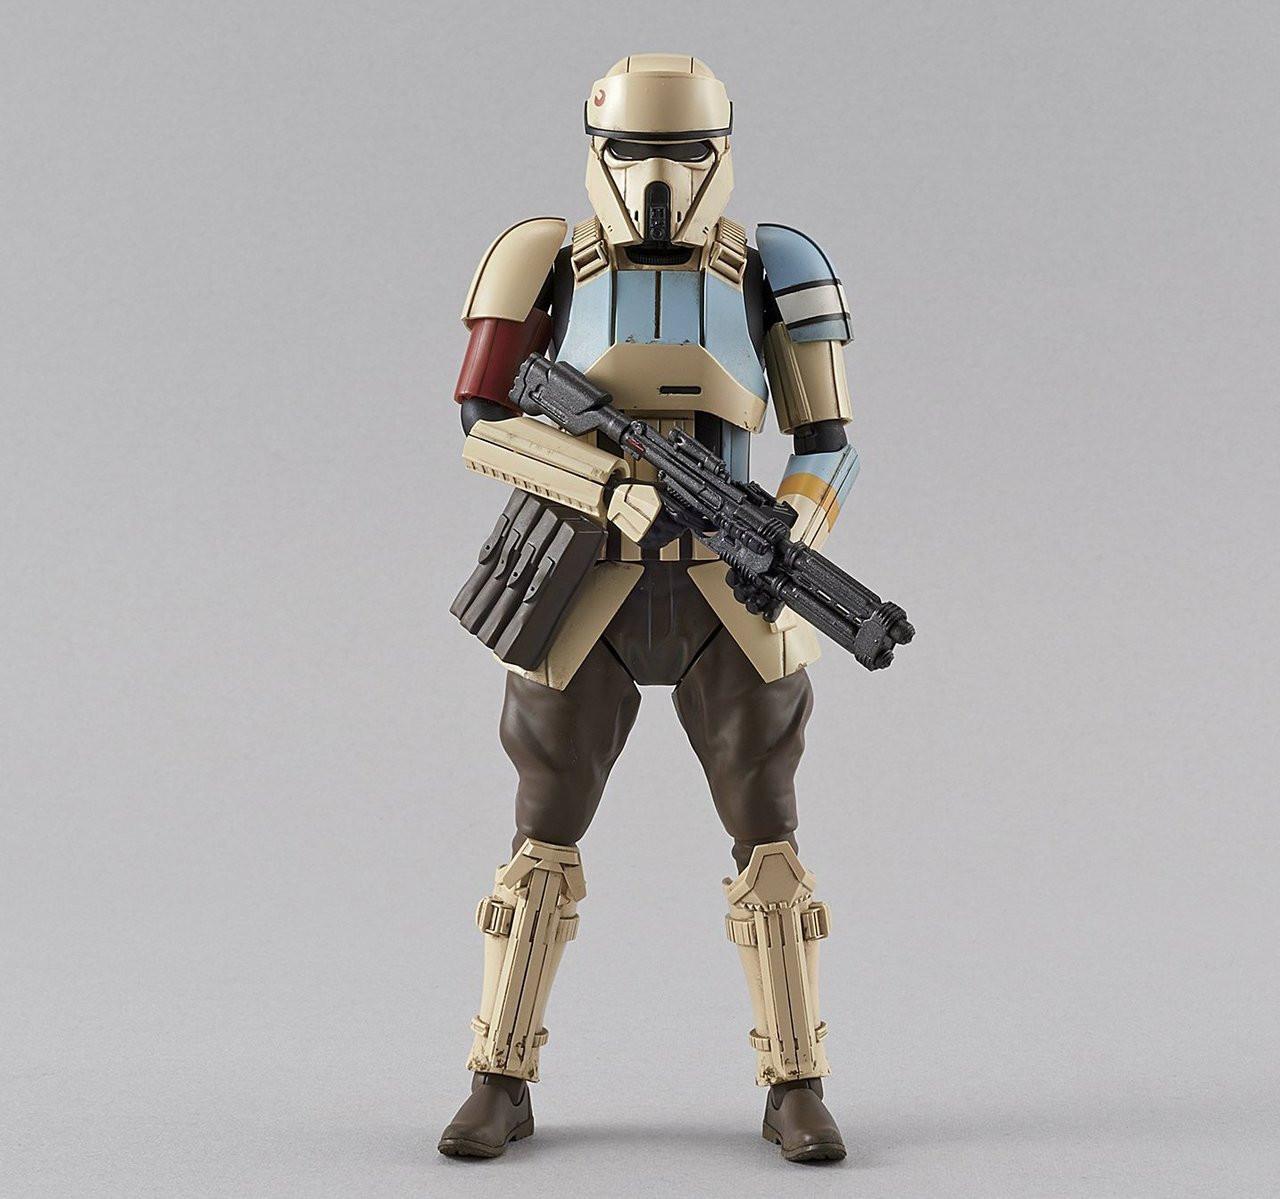 Star Wars Rogue One Shoretrooper Bandai Star Wars Character Model Kit